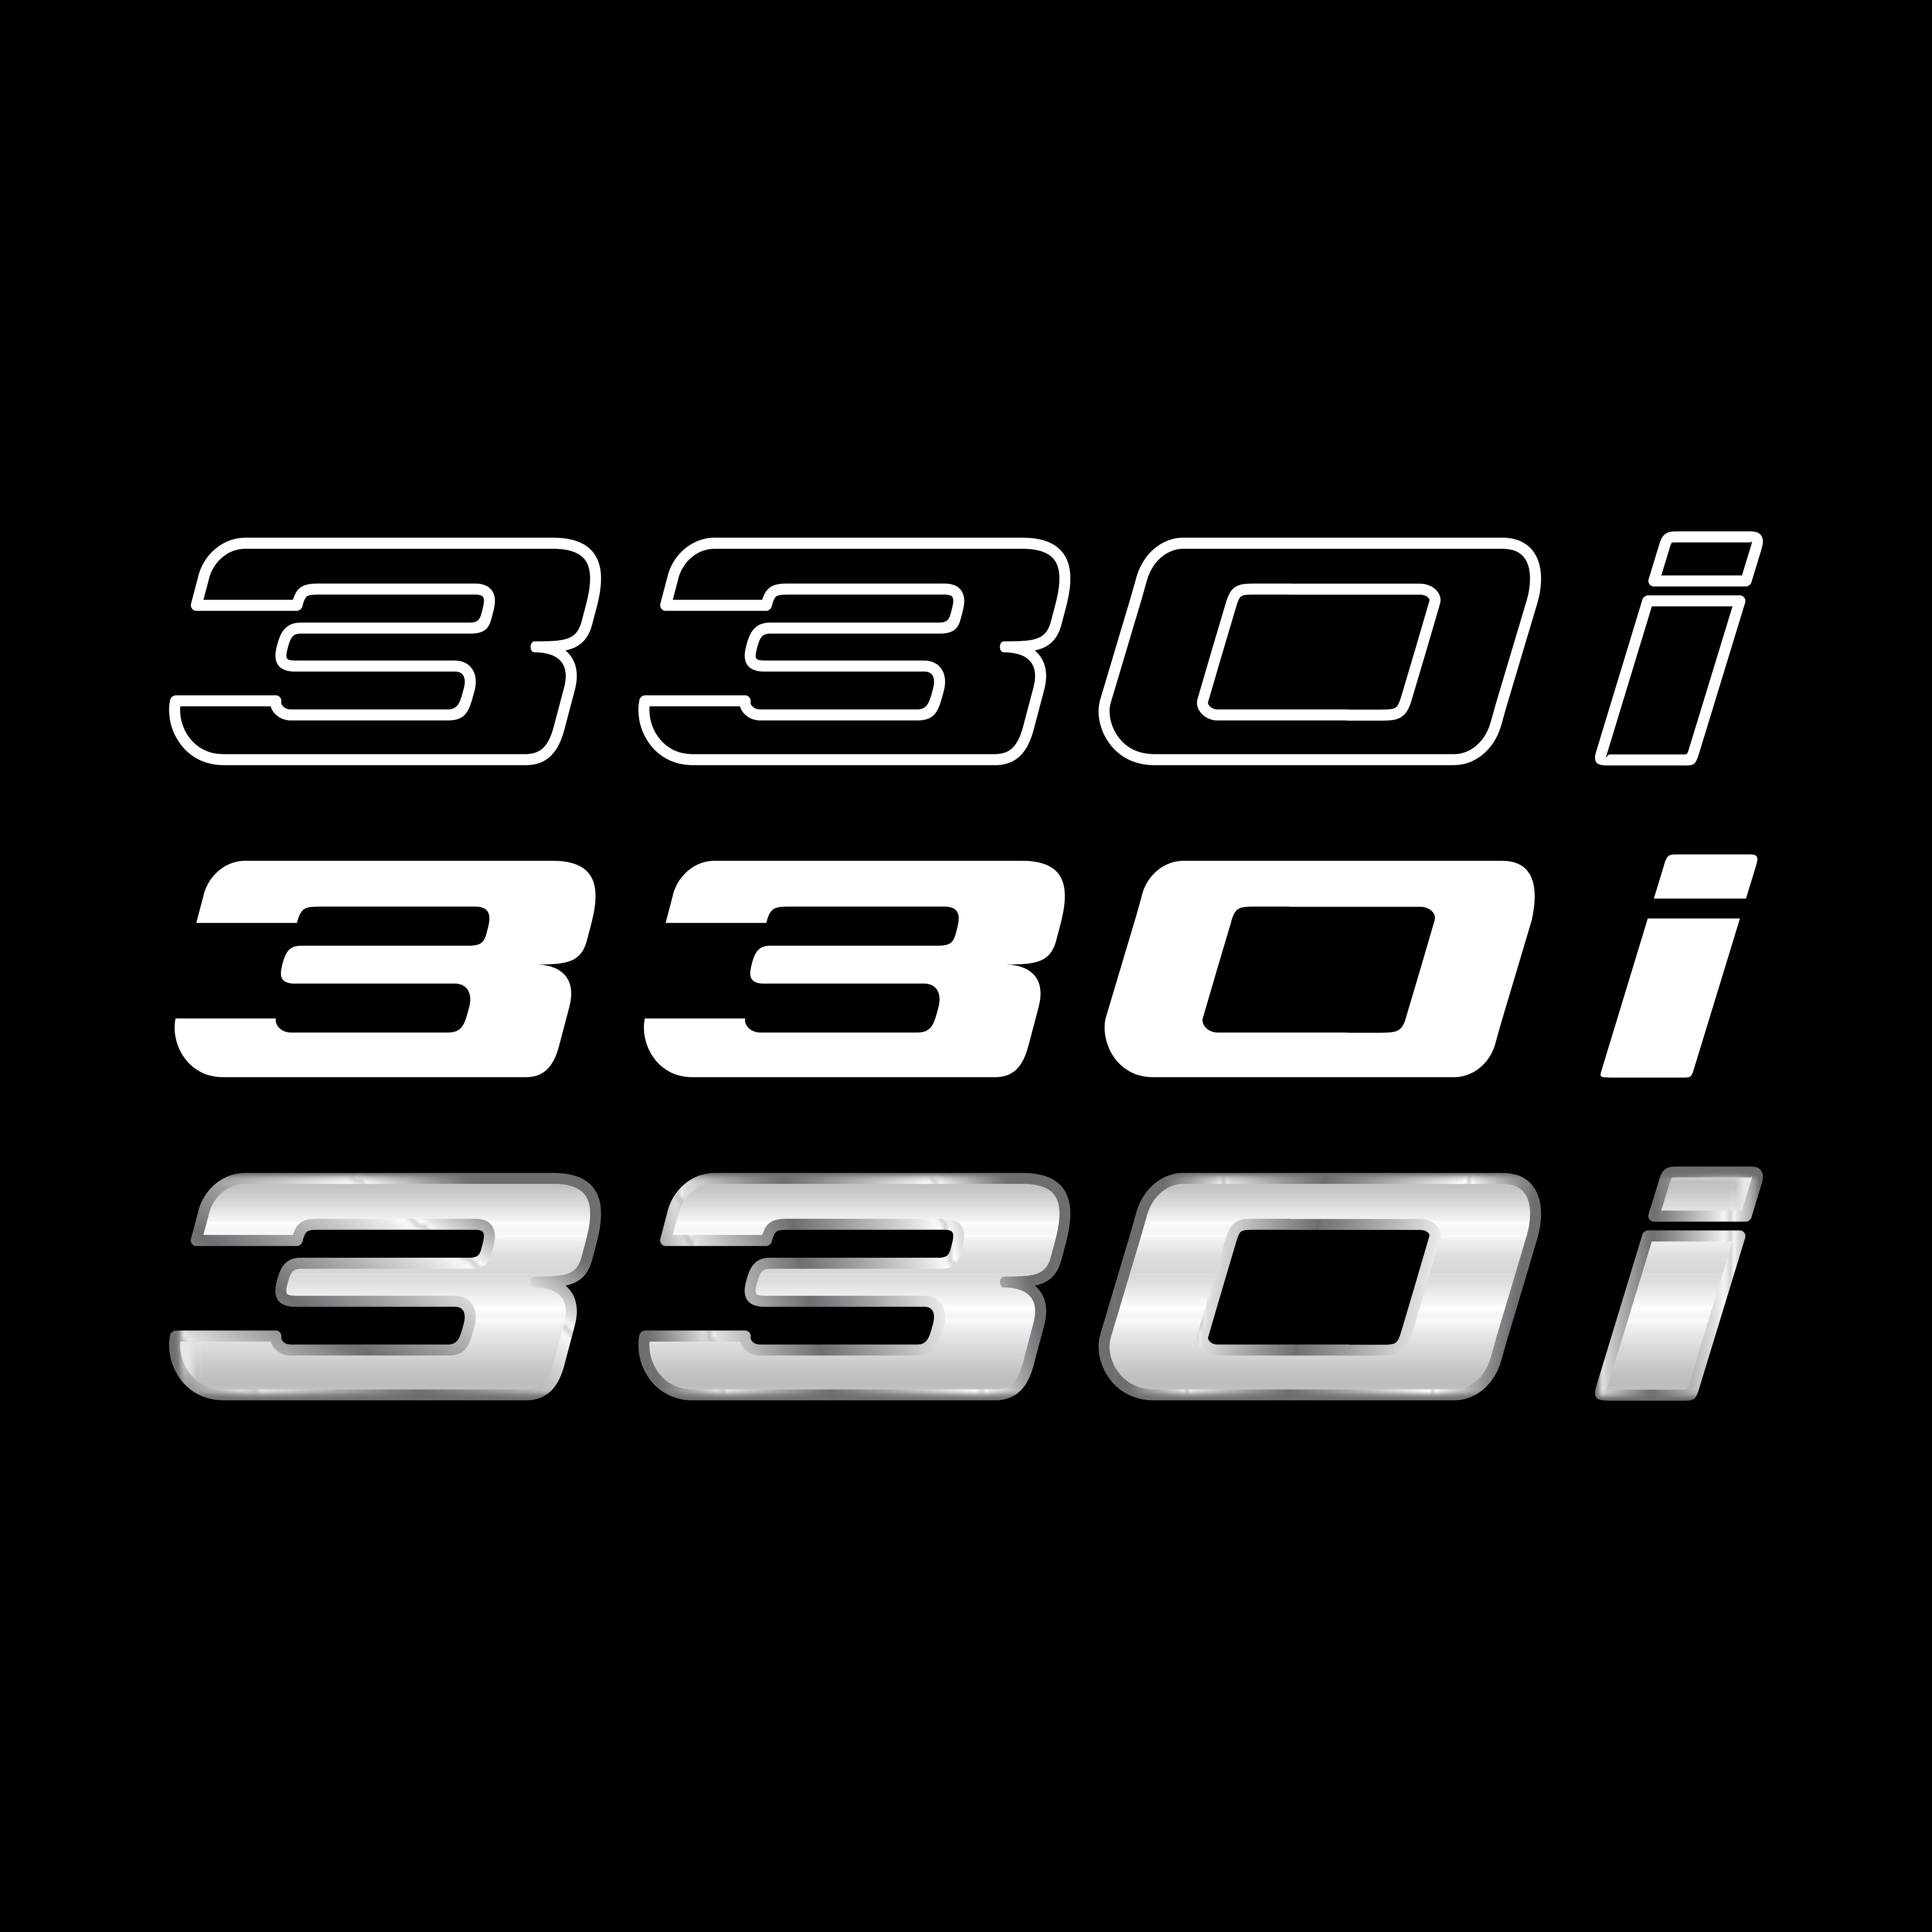 Auto Bmw: Logos Download